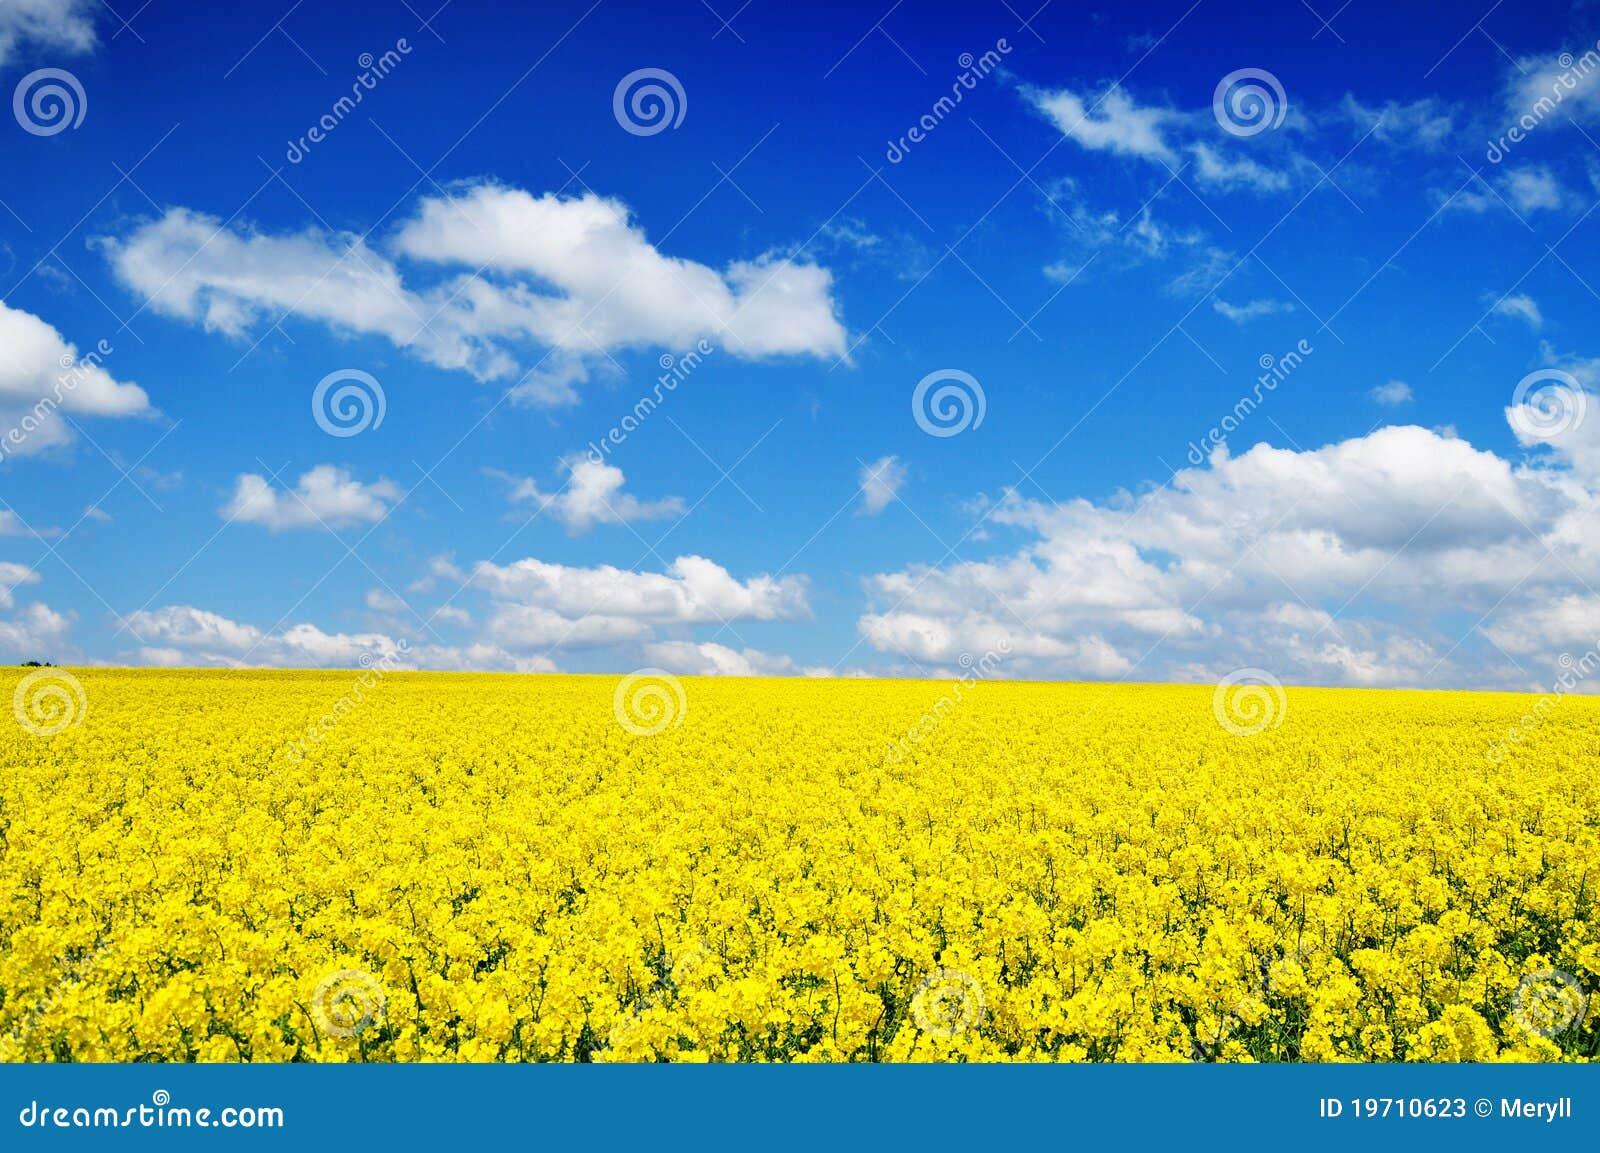 Canola field nature background